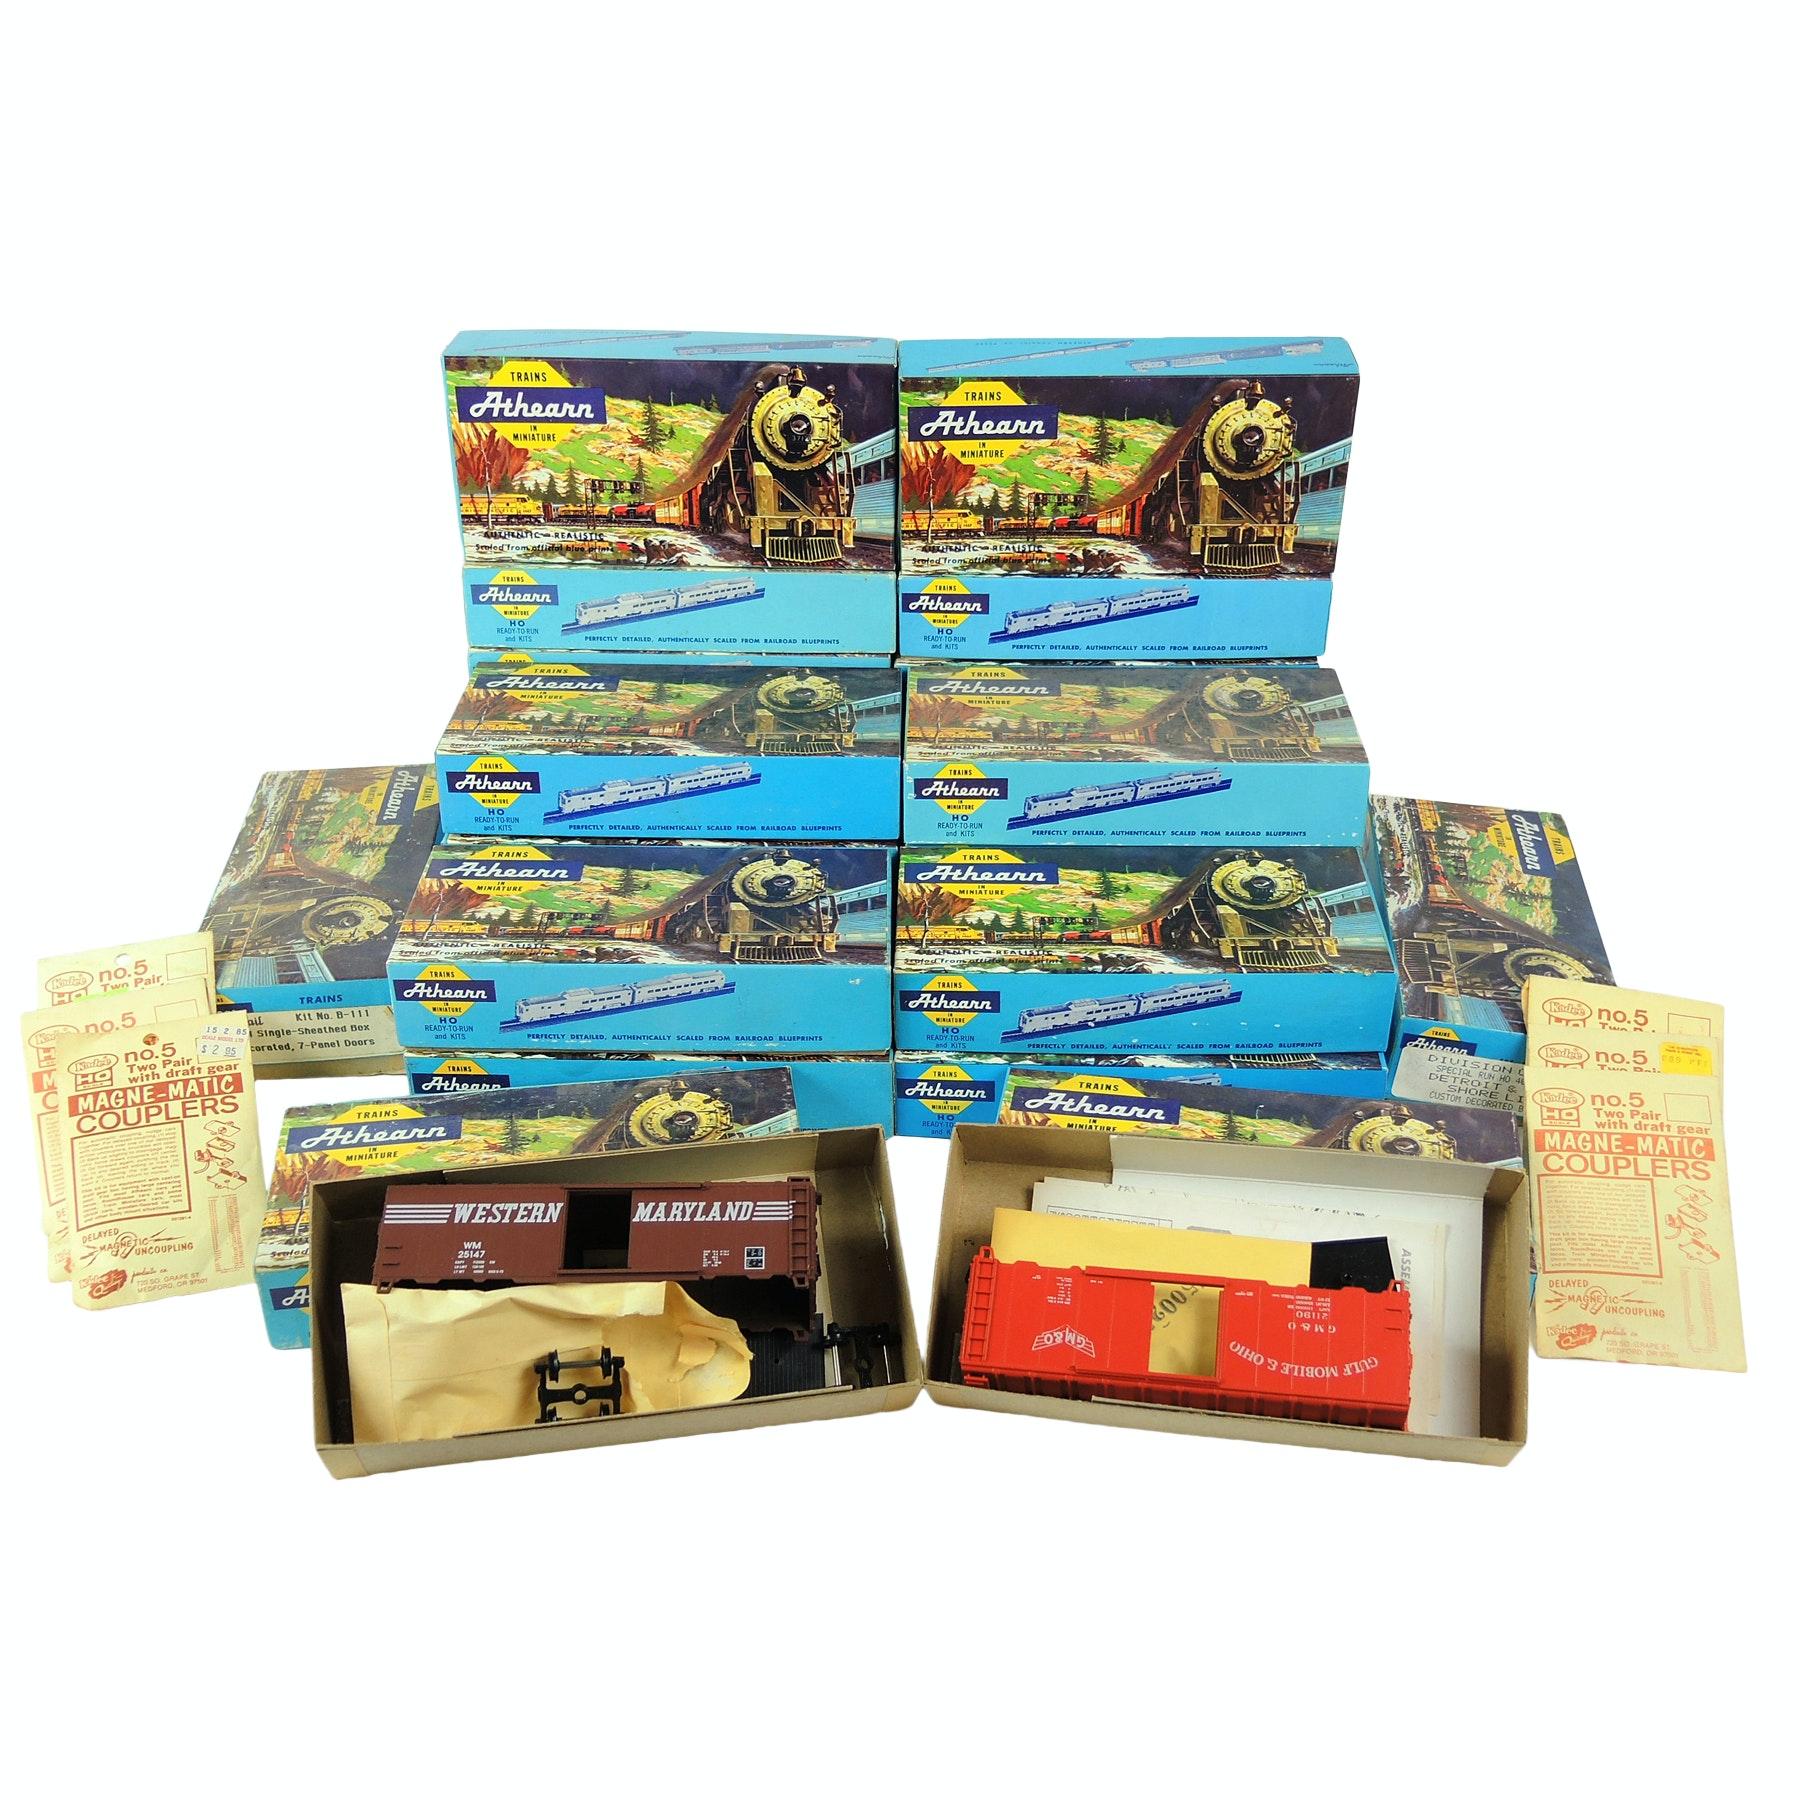 Athearn Model Train Kits and Kadee Magne-Matic Couplers